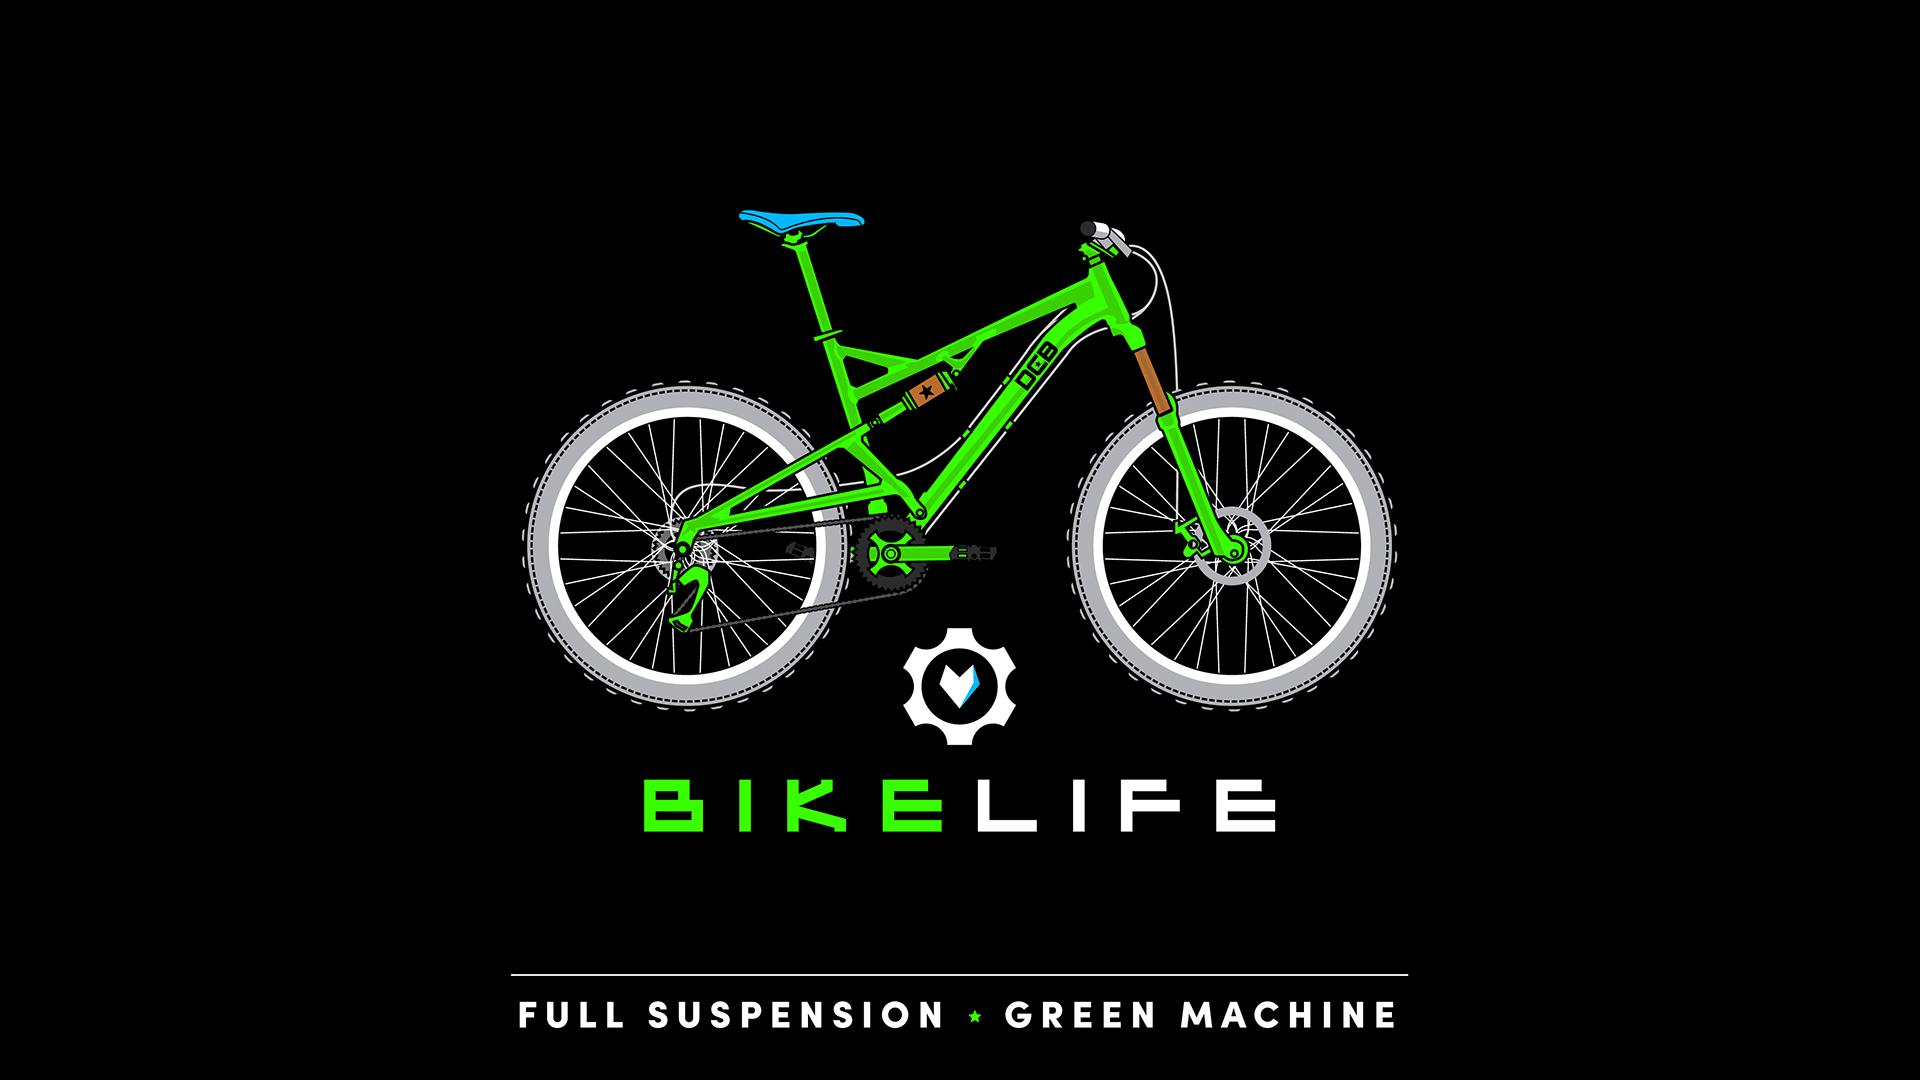 Bike Life Full Suspension Green Machine.jpg